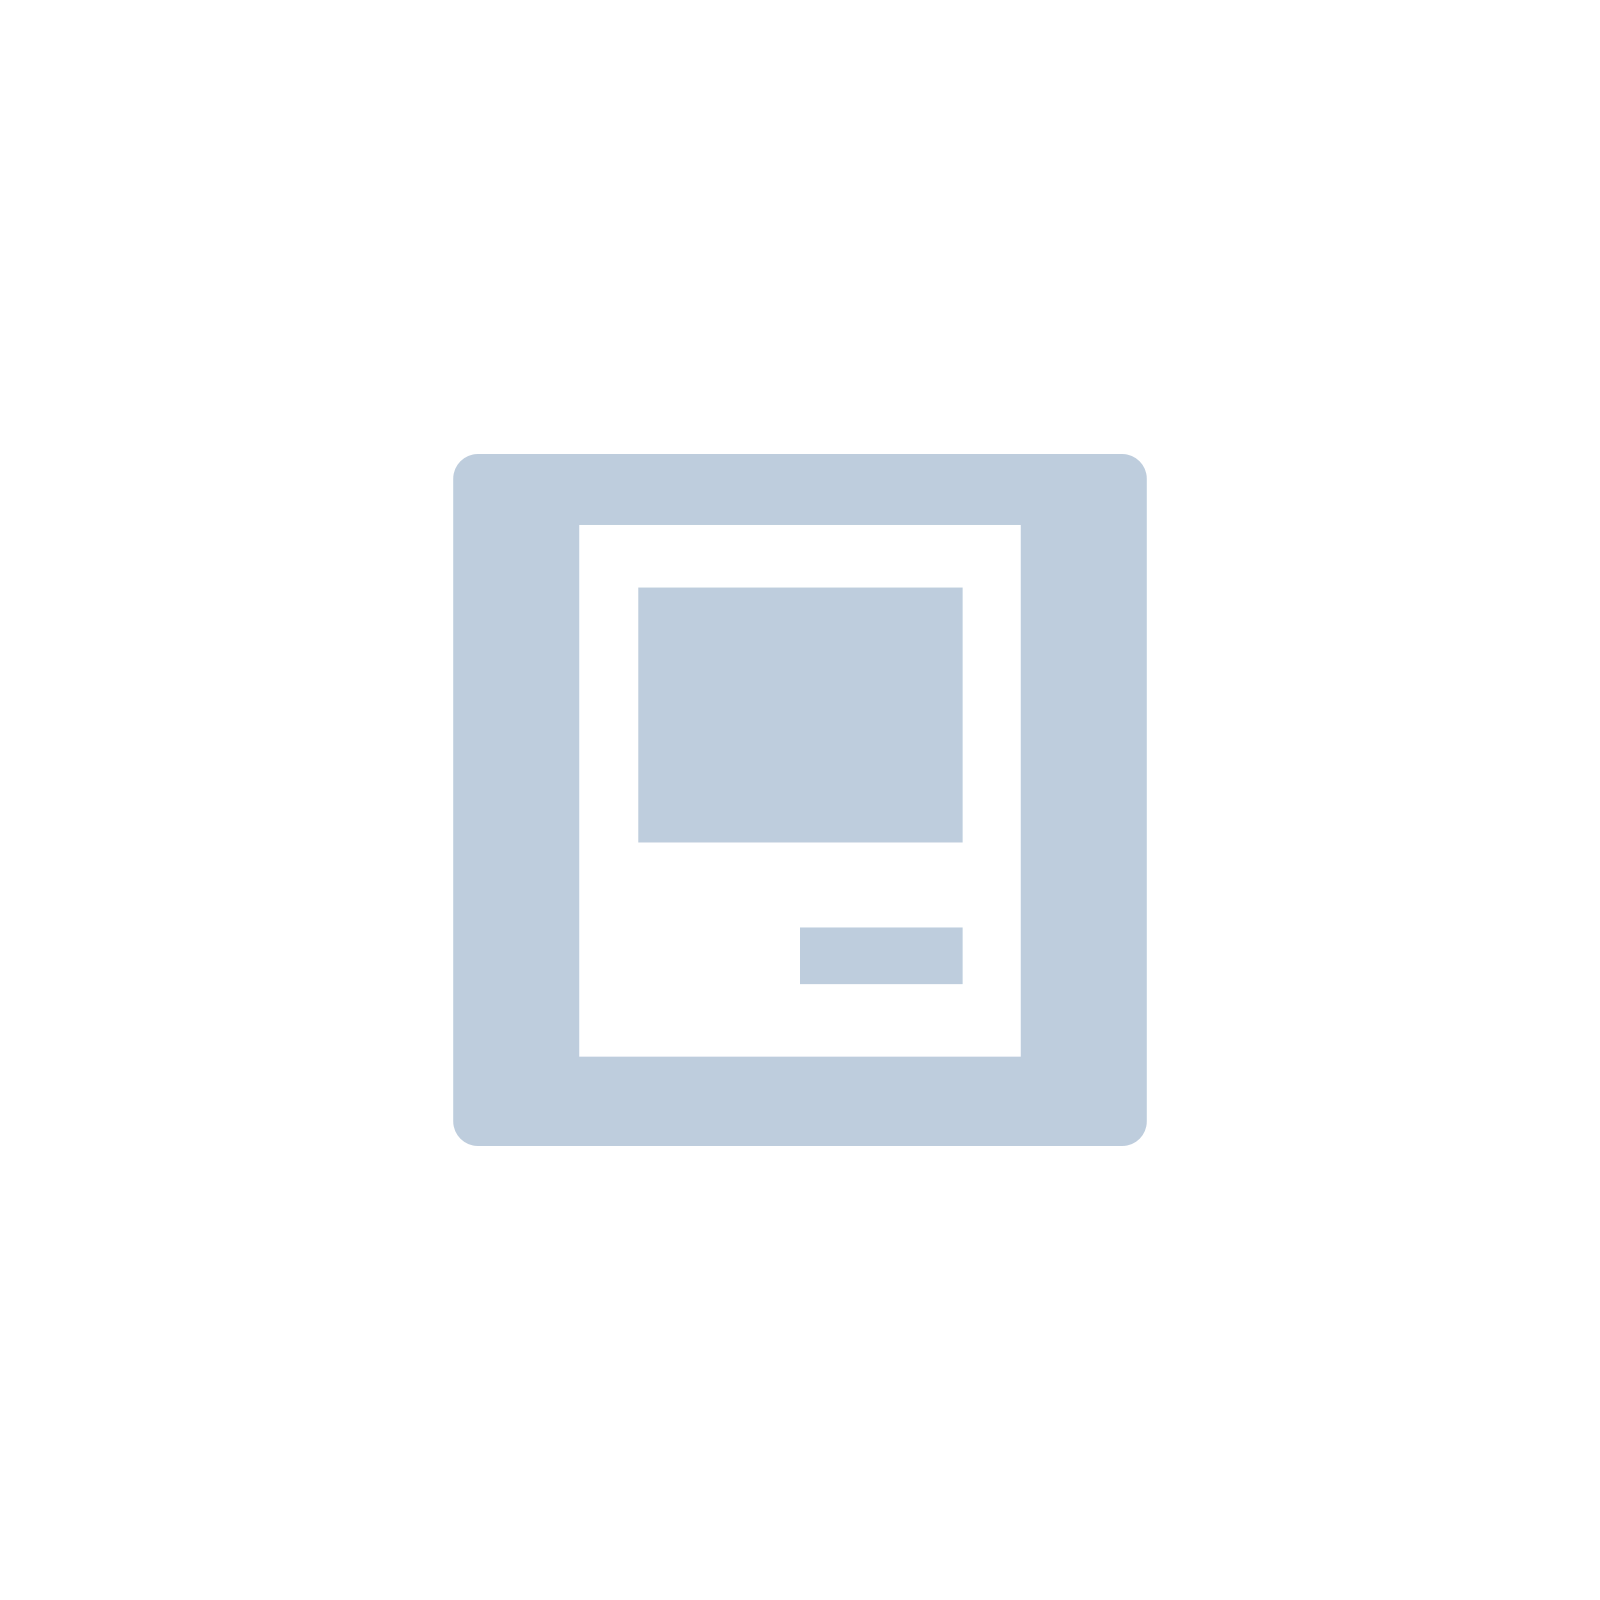 Mac mini Core 2 Duo 2.66 GHz (Macmini4,1, 500GB, 4GB)